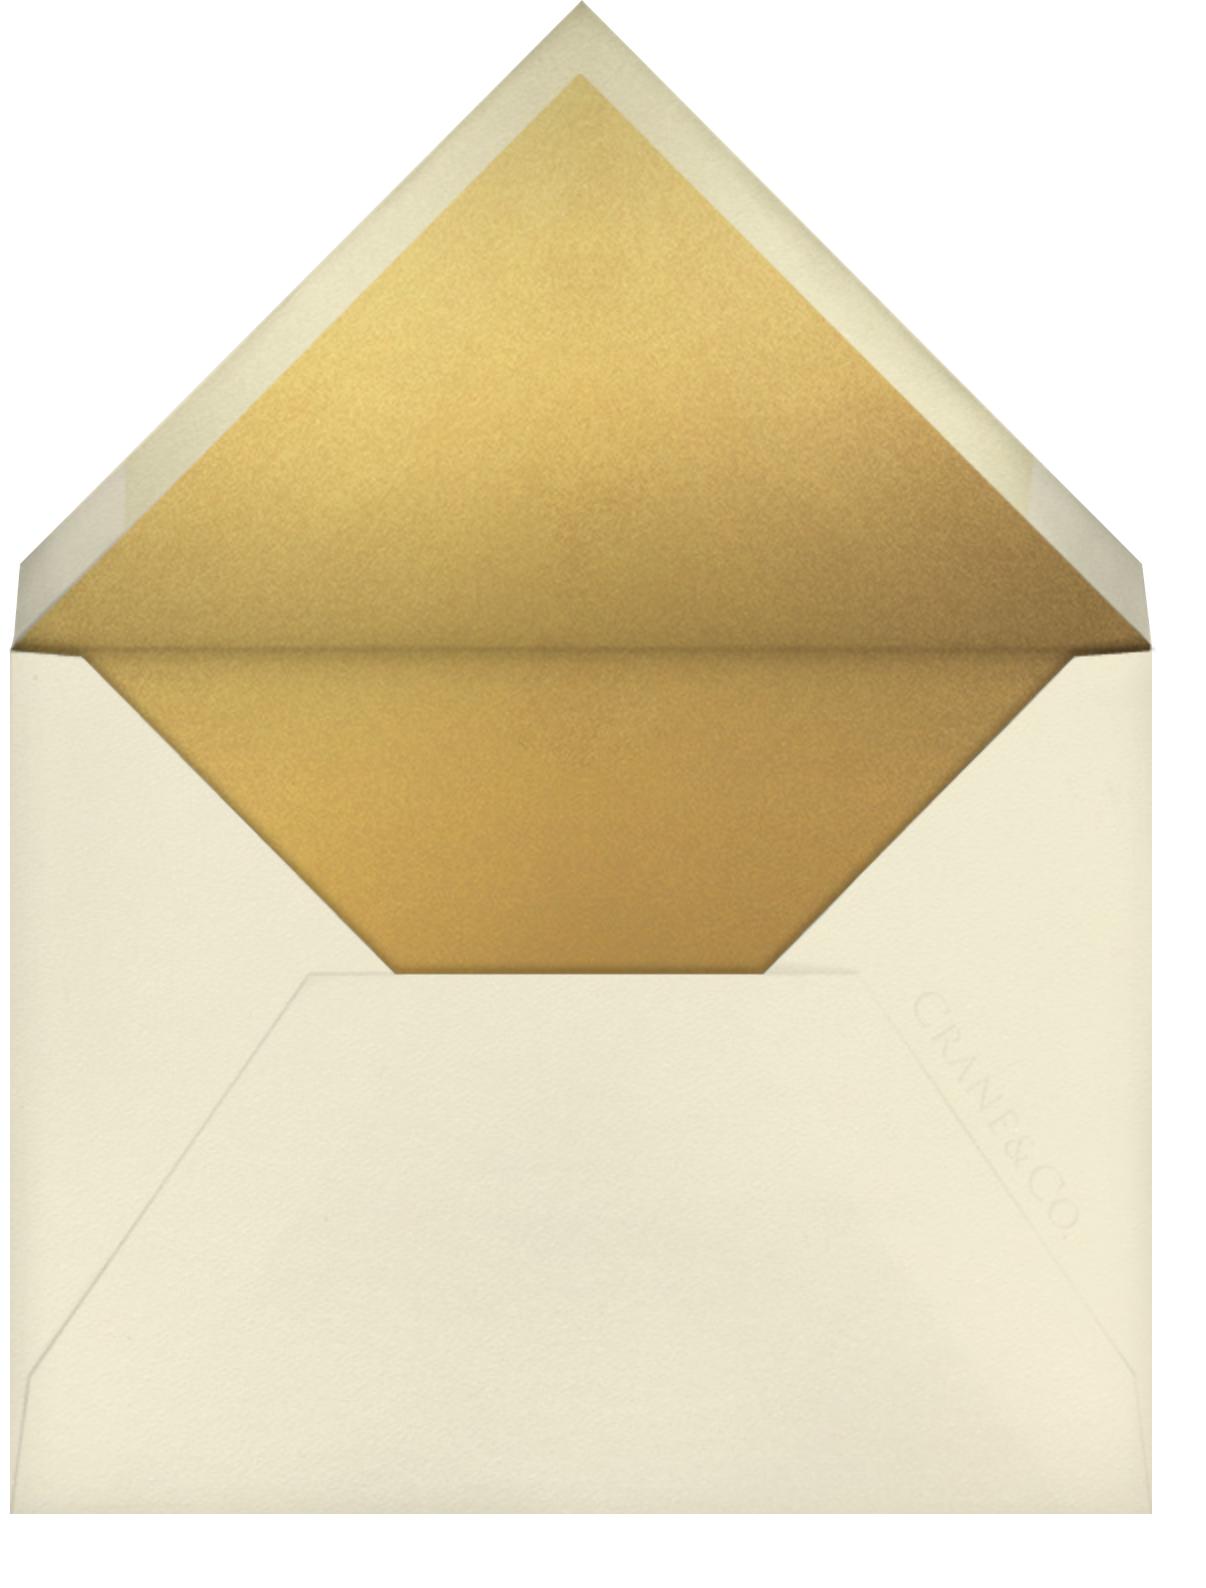 Silk Road (Thank You) - Geranium/Gold - Crane & Co. - null - envelope back